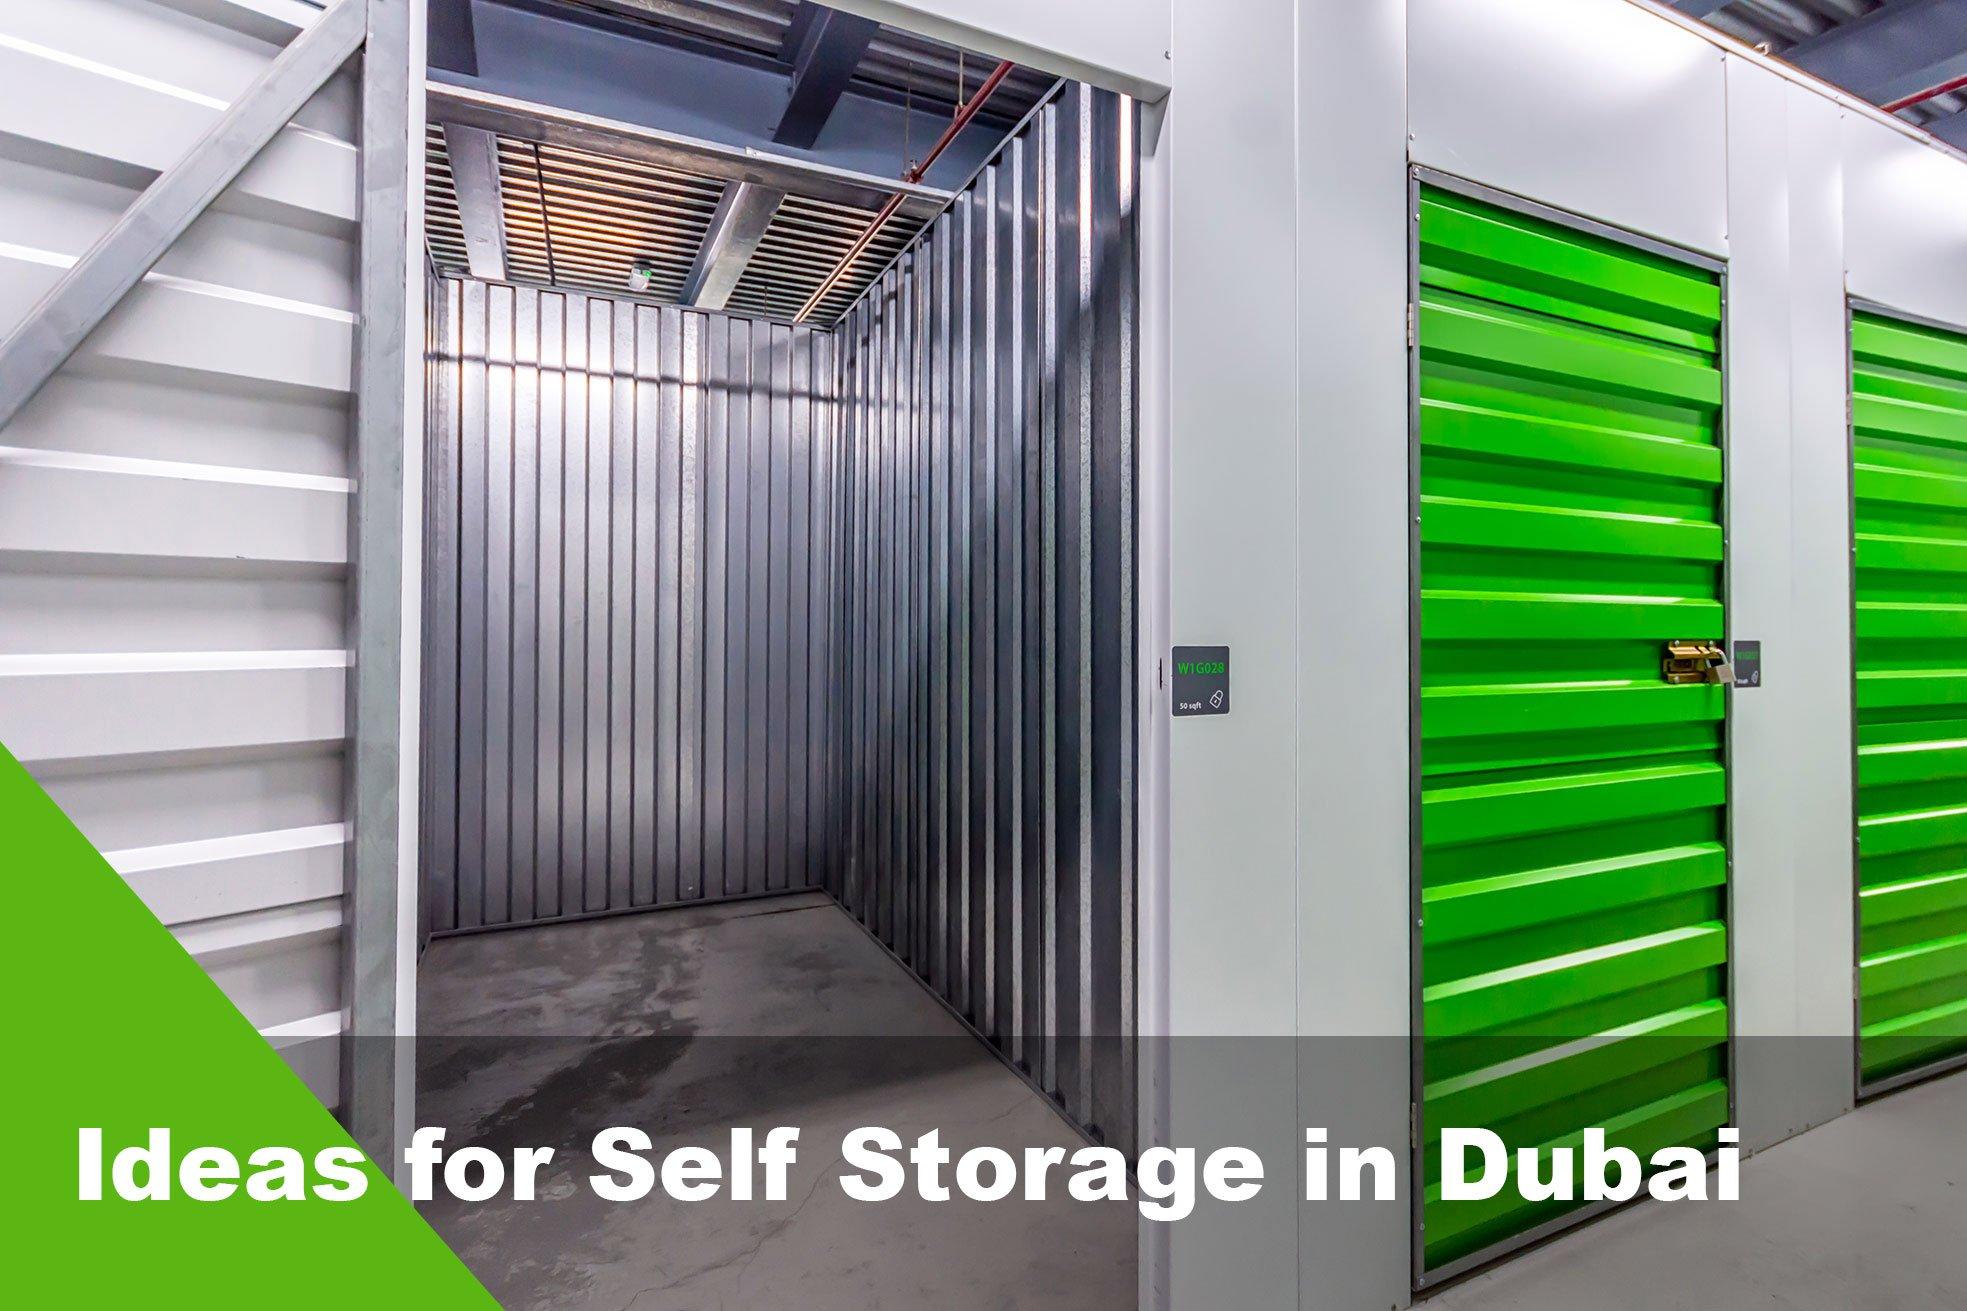 ideas-self-storage-dubai-blog-post